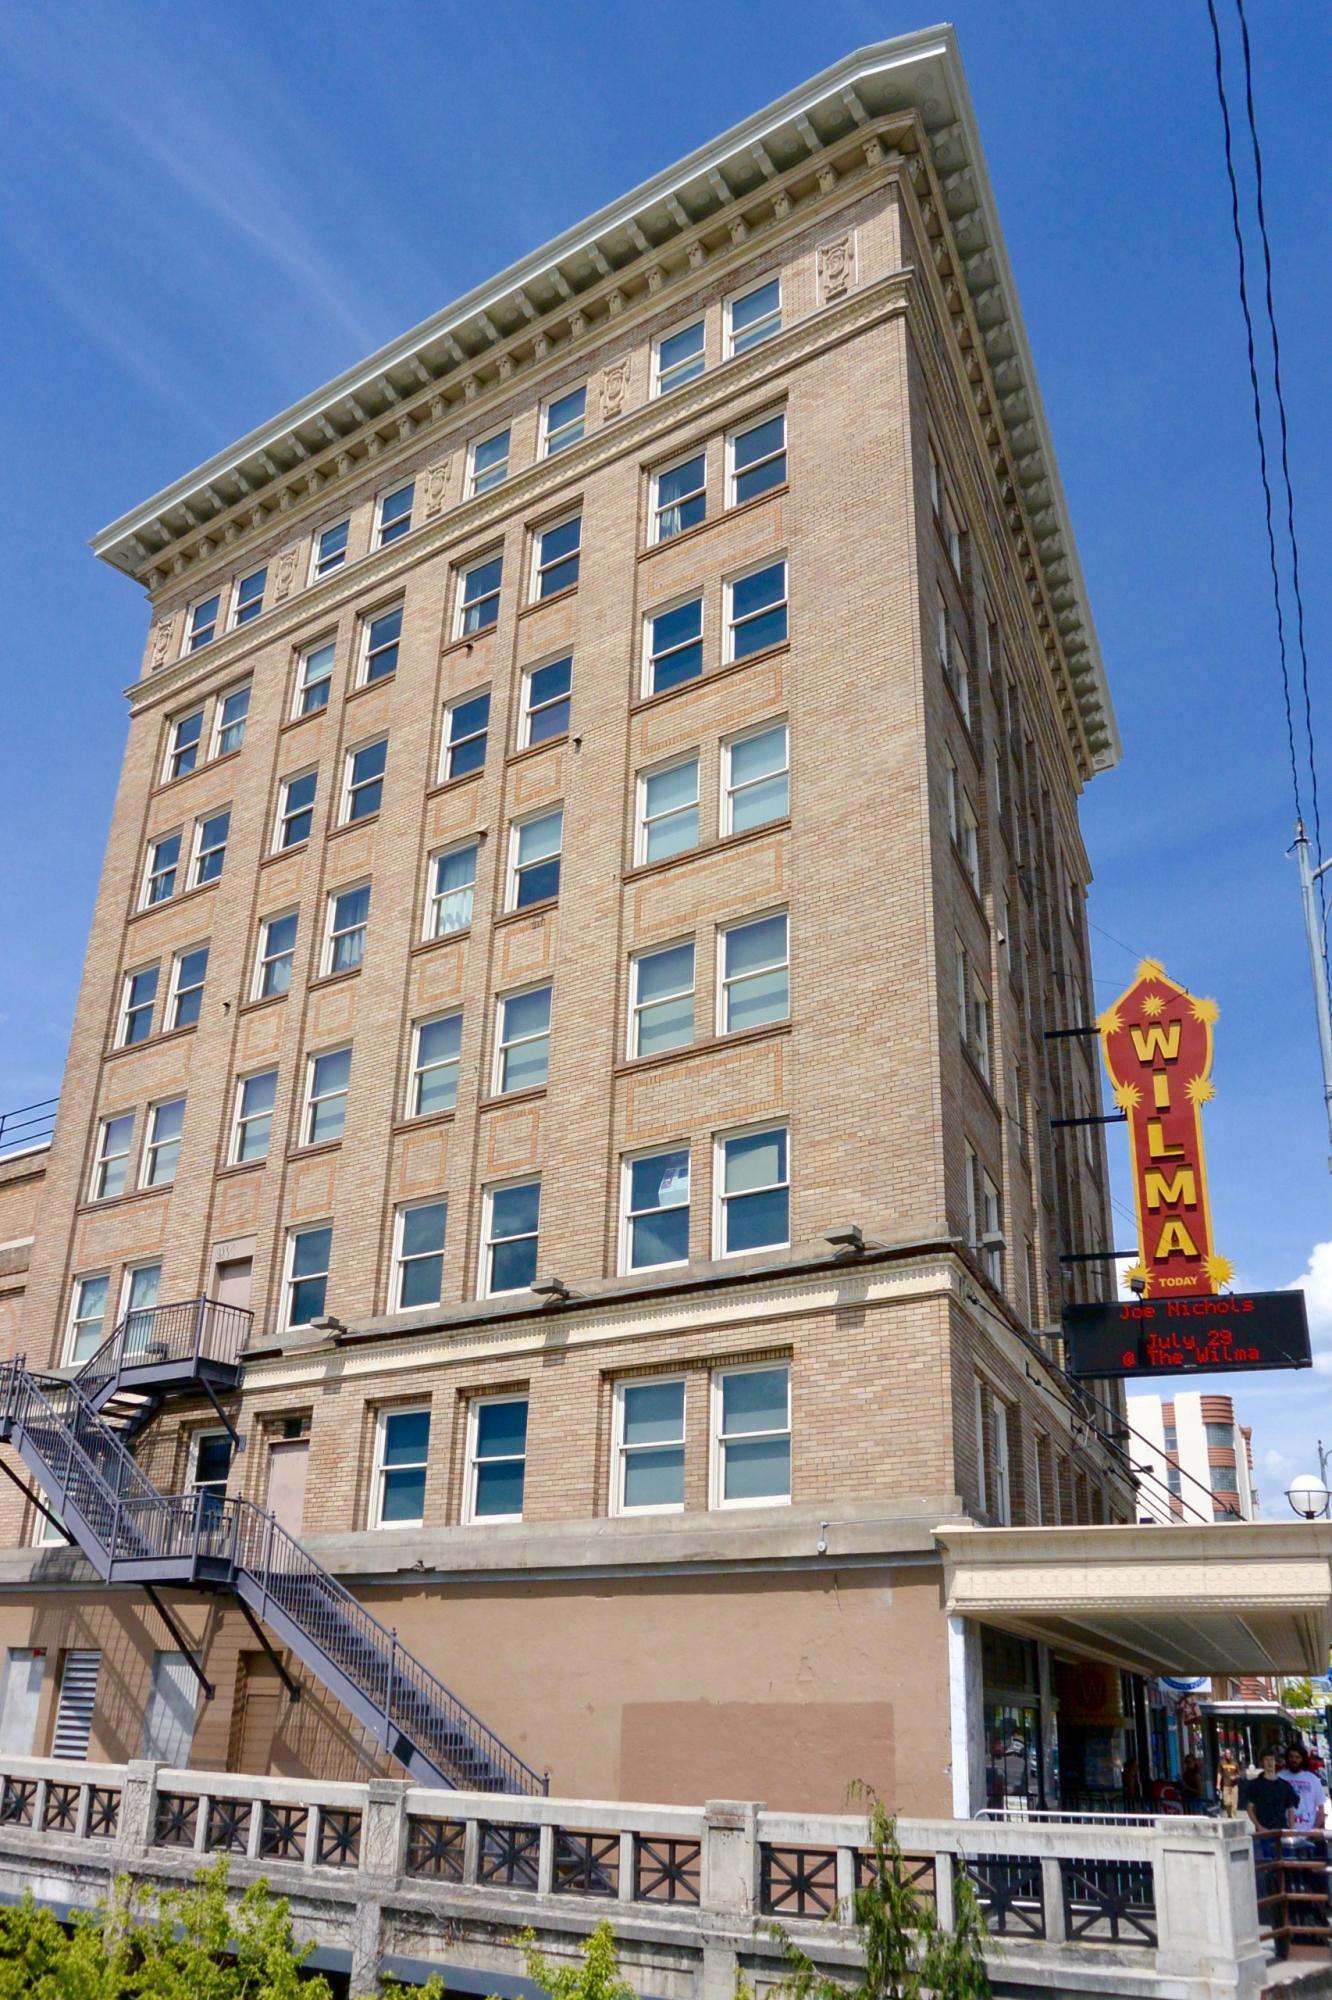 131 South Higgins Avenue, Unit 8-1, Missoula, MT 59802